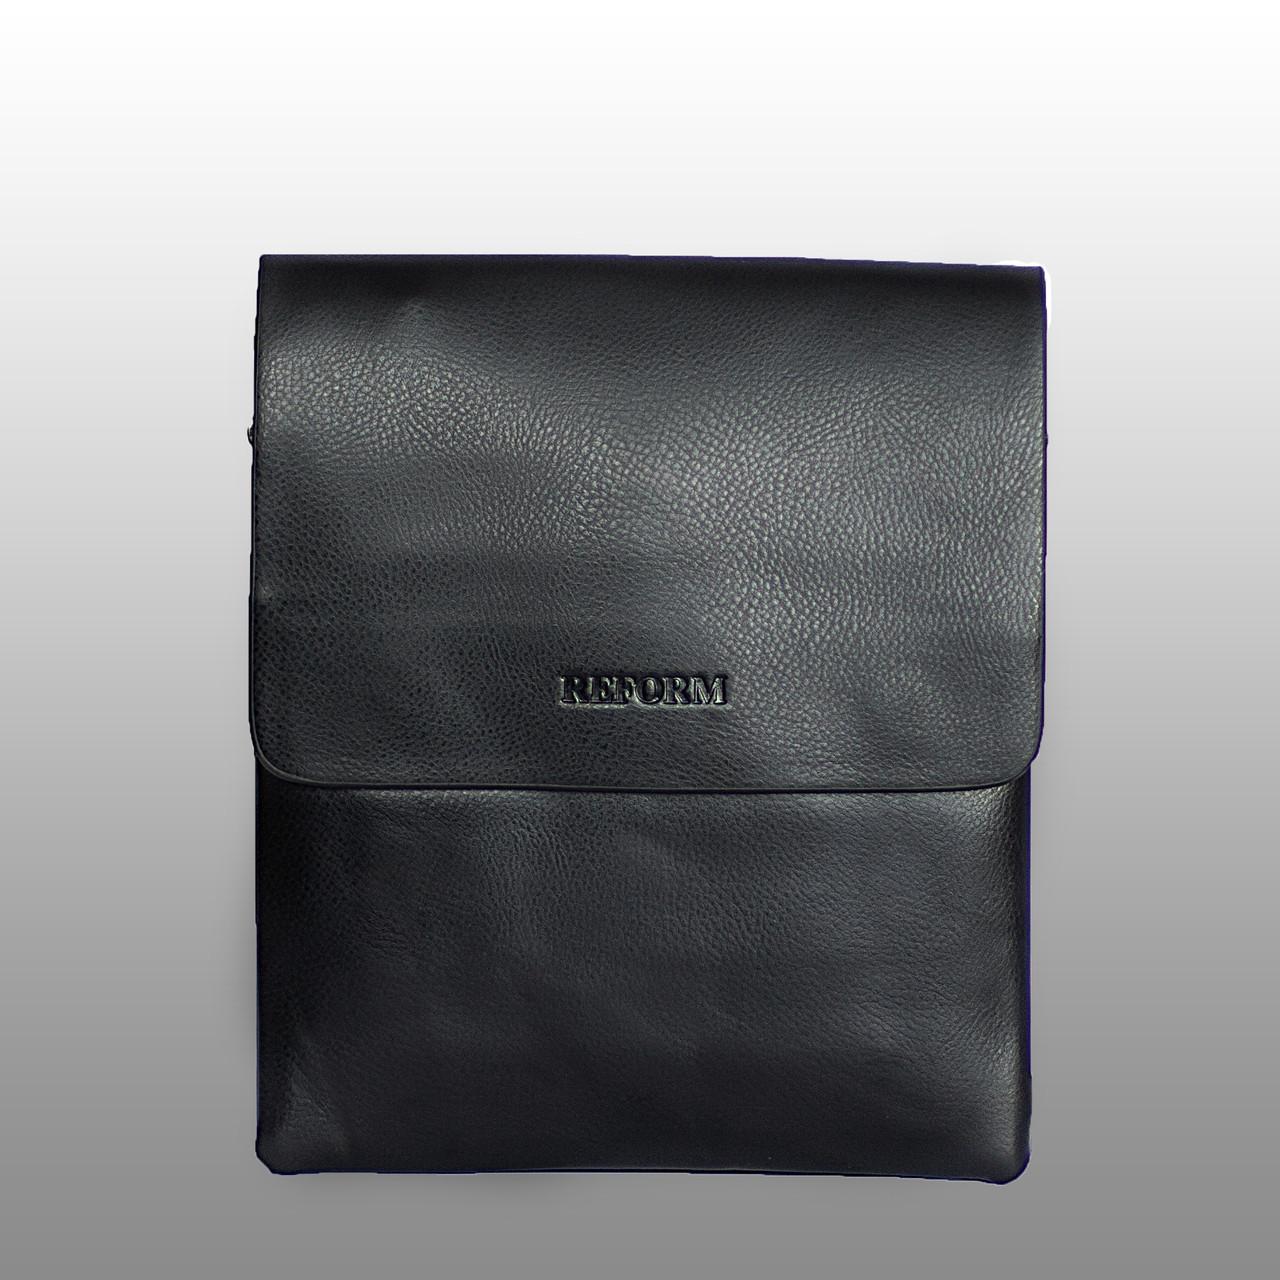 Мужская сумка Reform 25x21, черная